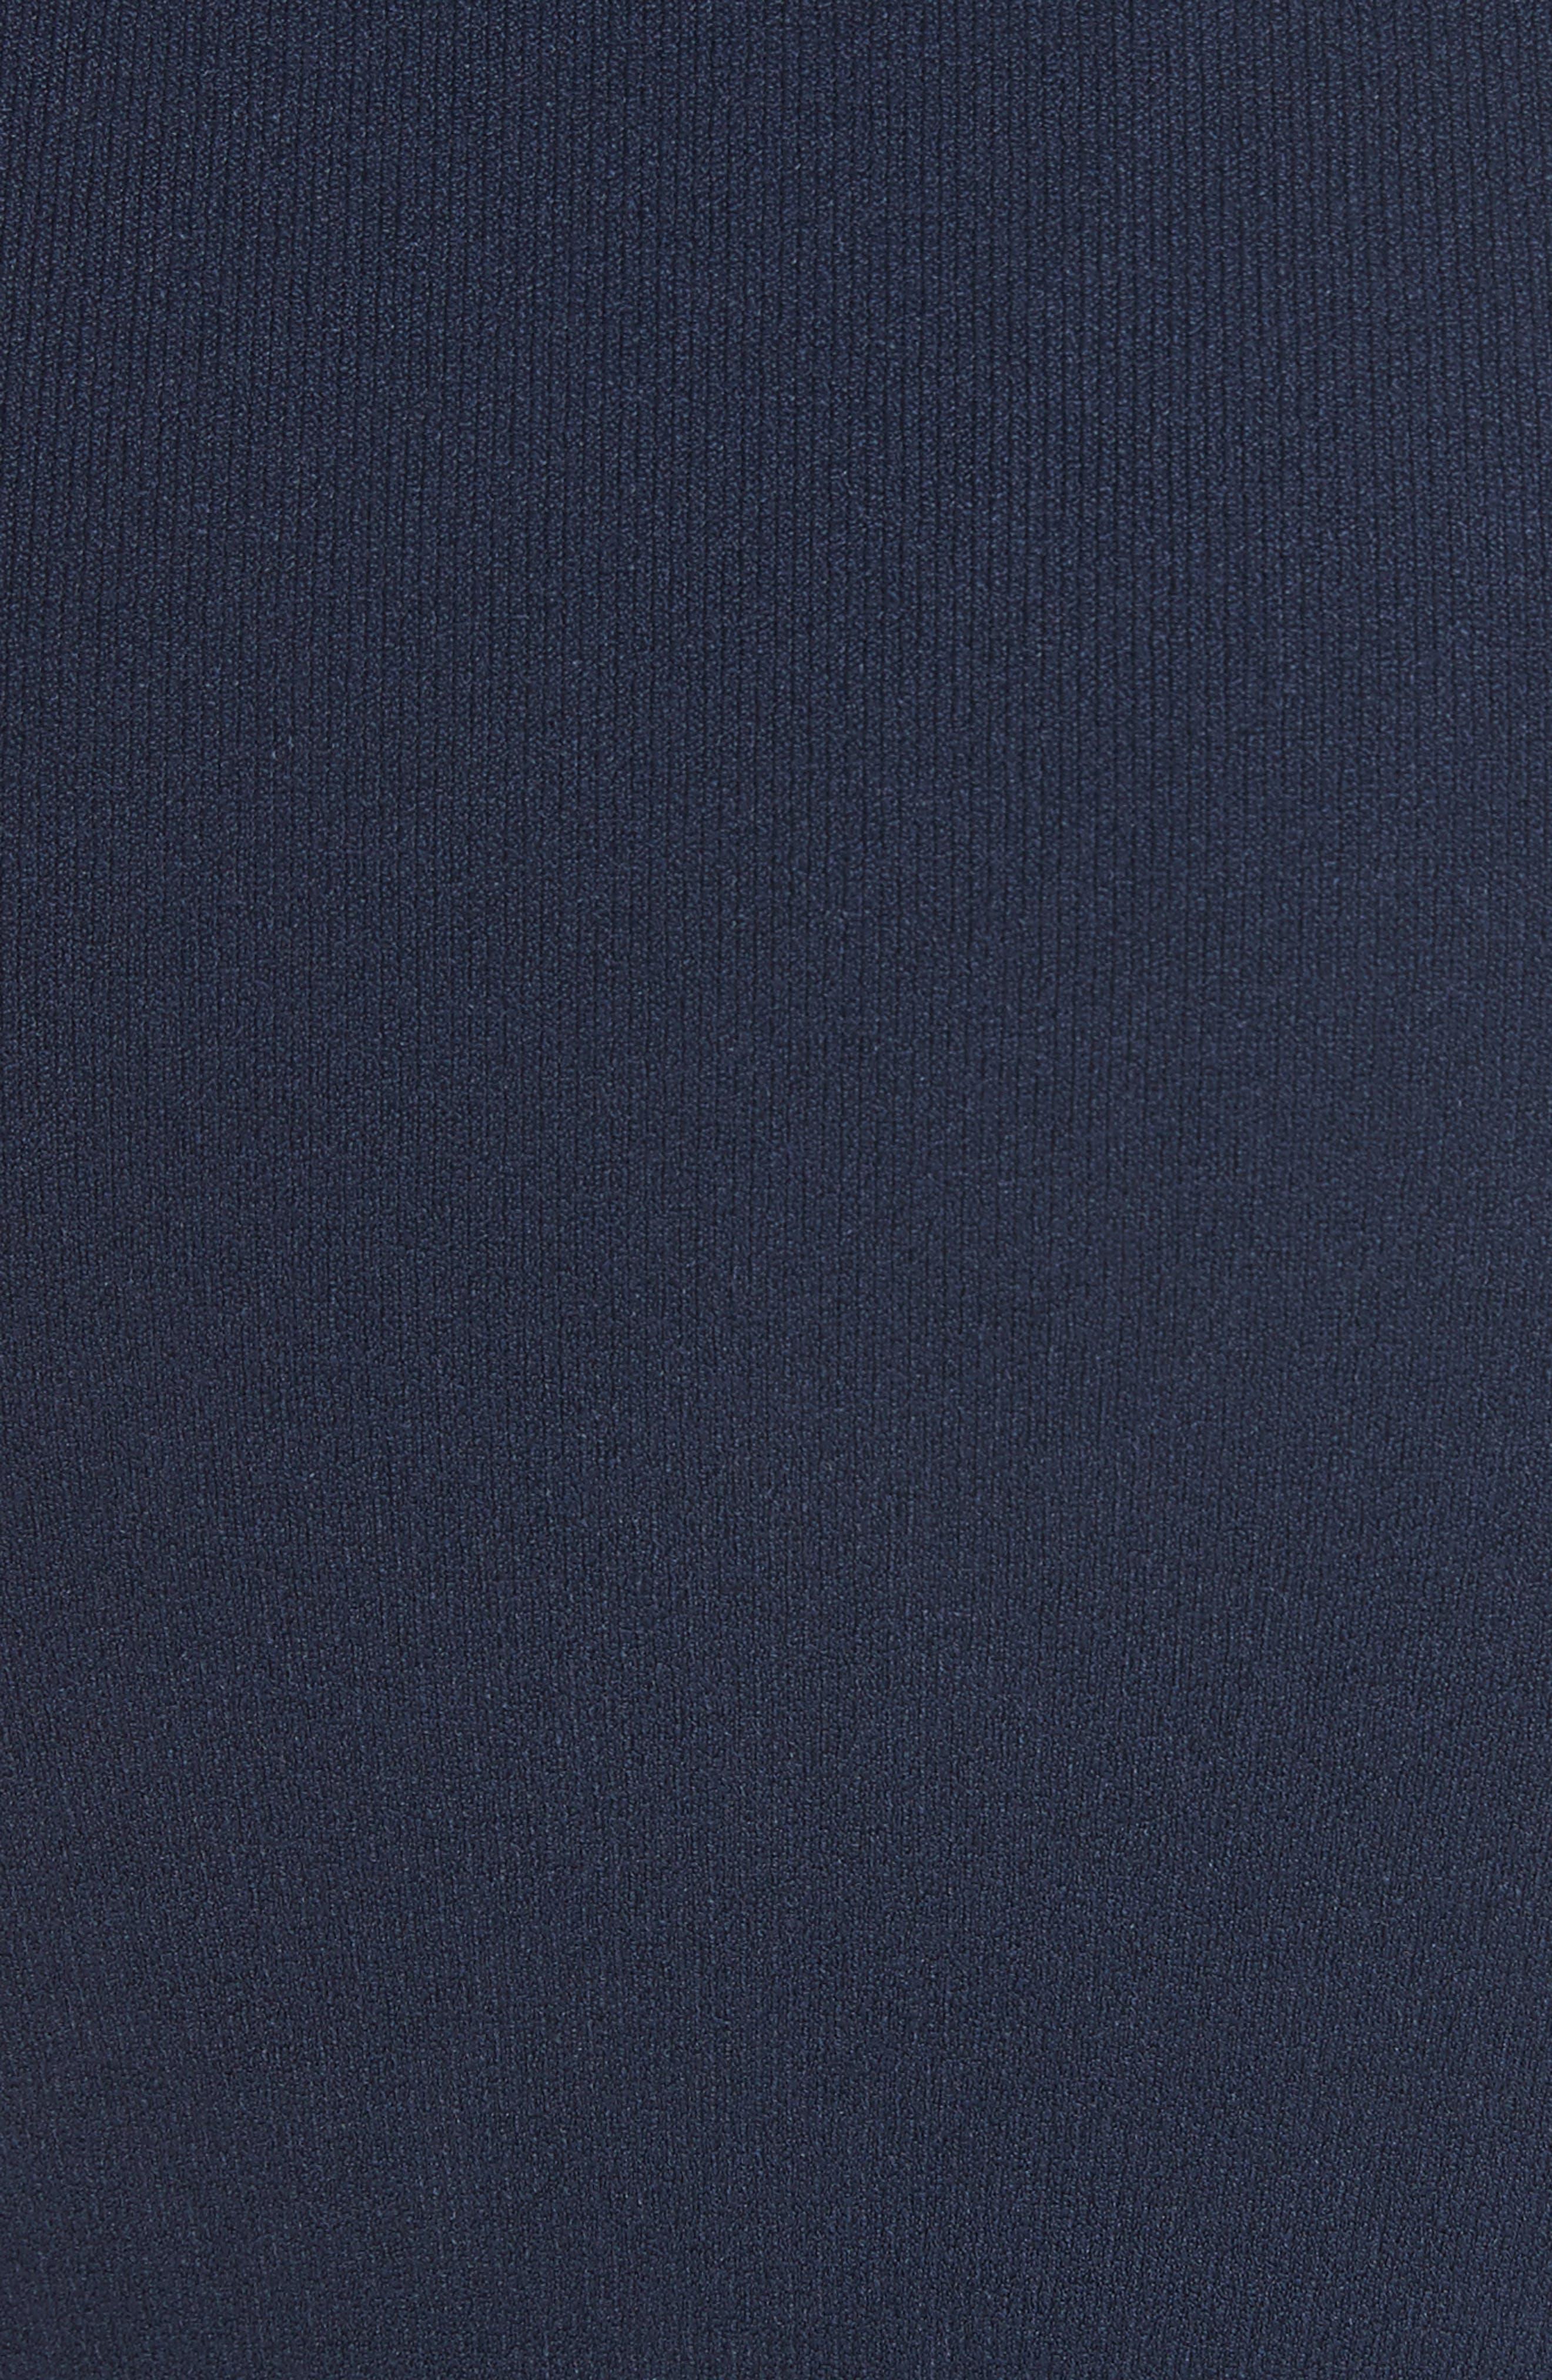 Ruched Midi Skirt,                             Alternate thumbnail 5, color,                             Navy